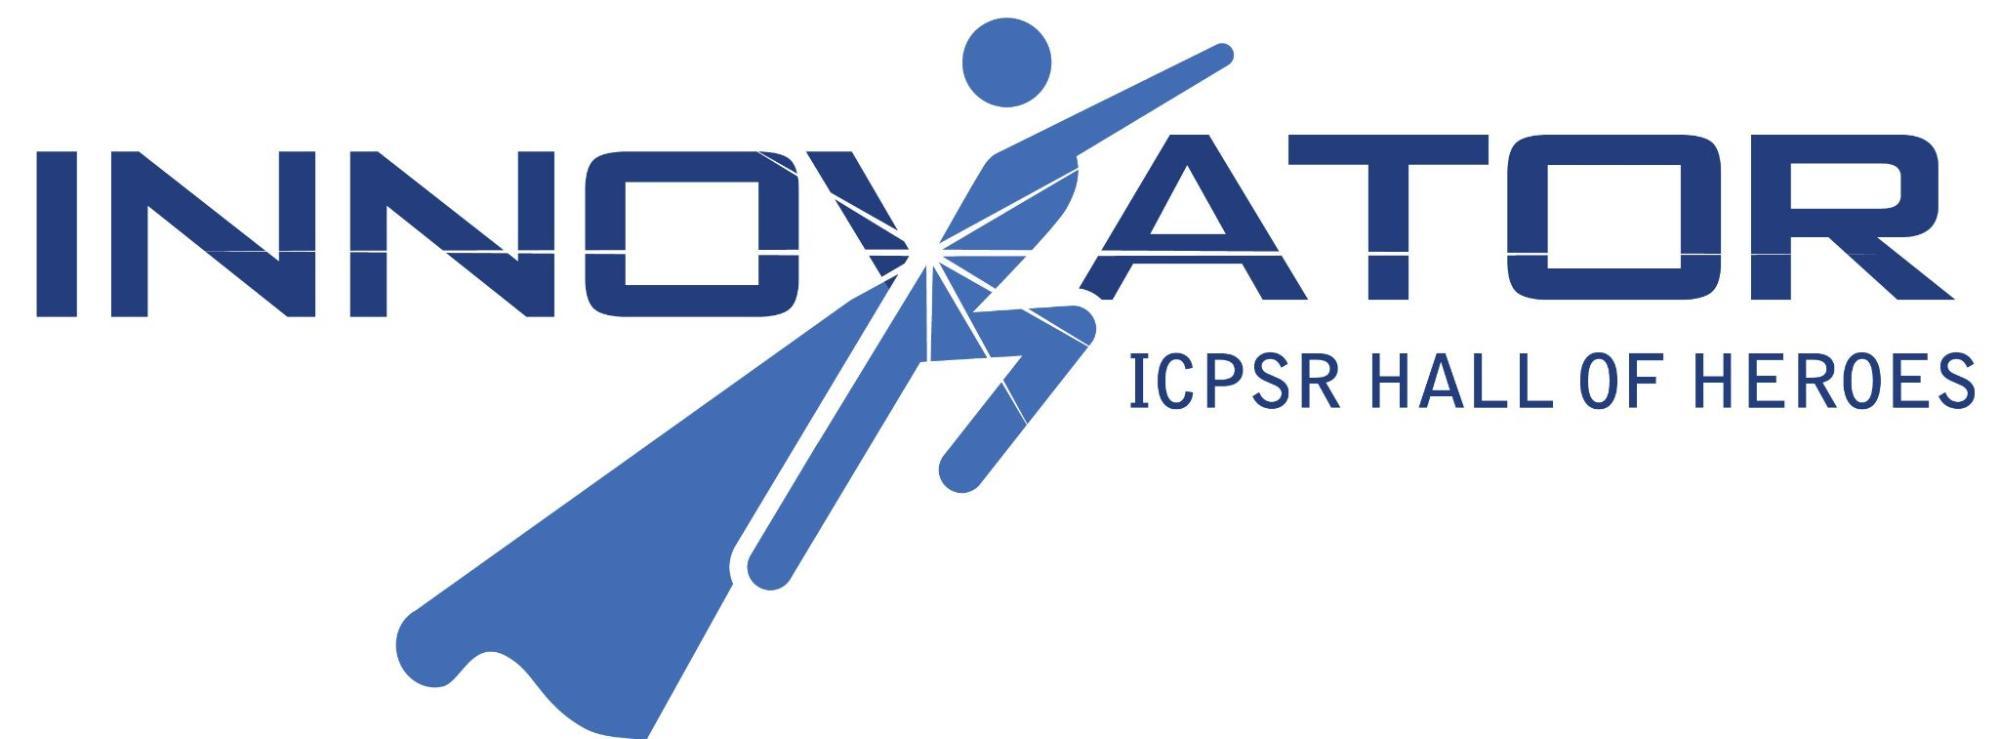 Logo: Innovator - ICPsR Hall of Heroes